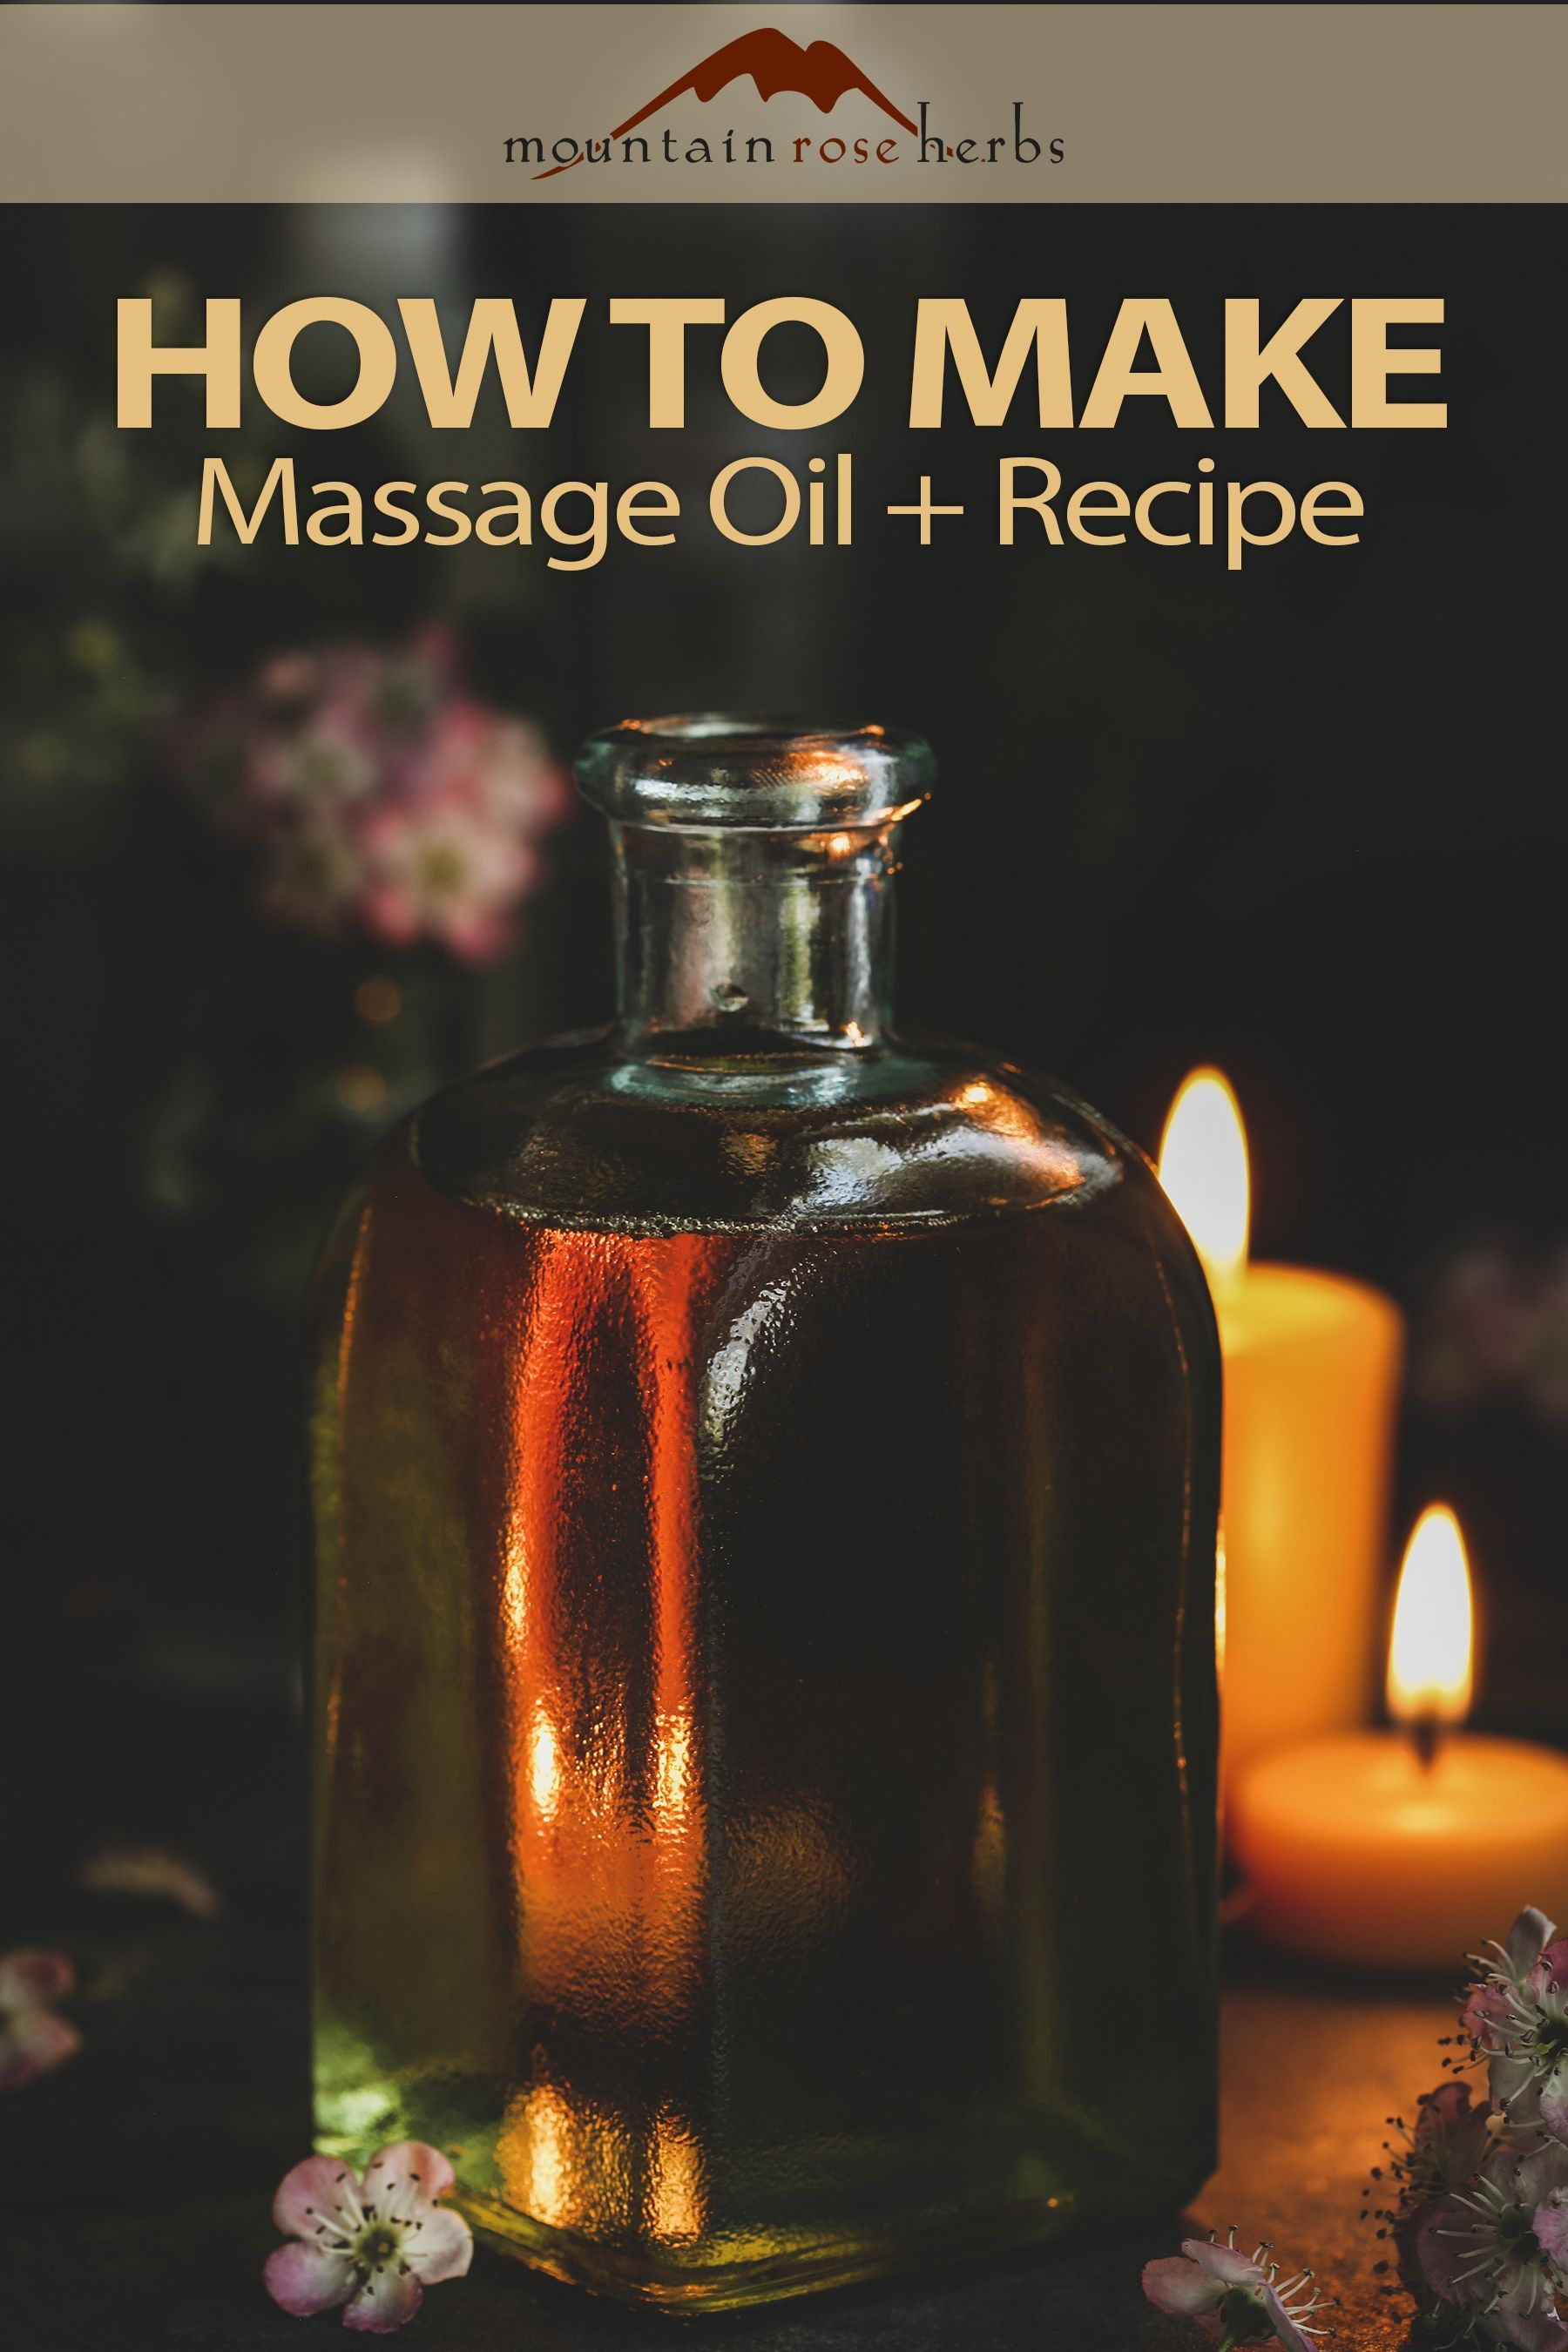 DIY Massage Oil Recipe with Essential Oils